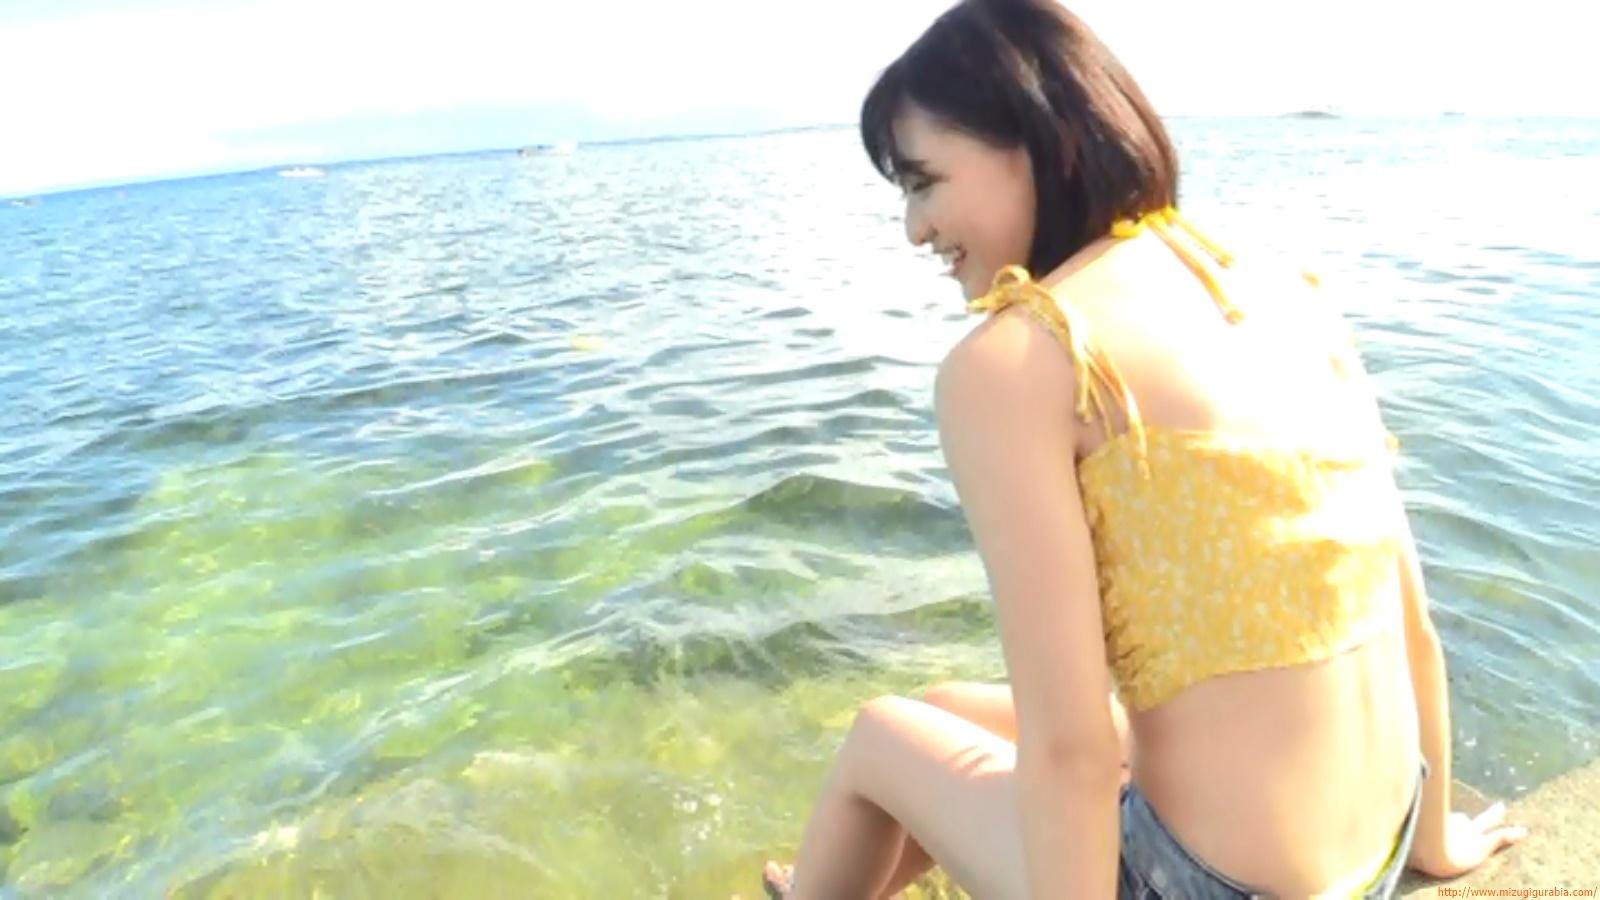 Beach dating045